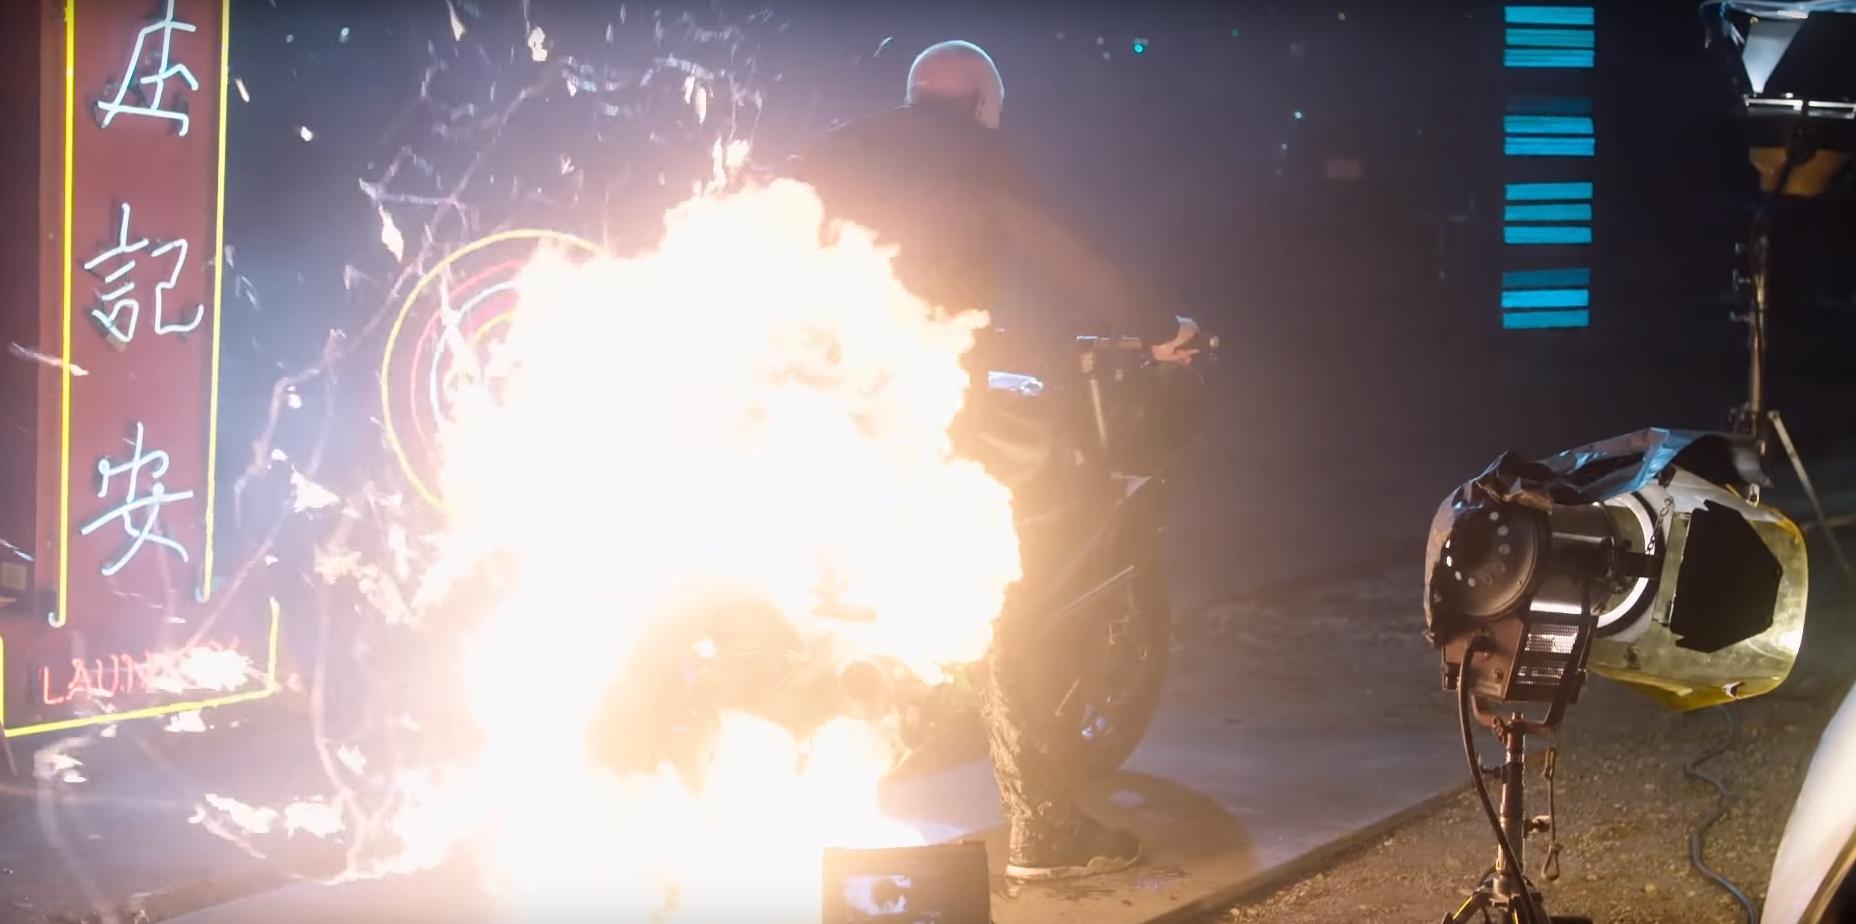 Eminem - Phenomenal (Behind The Scenes) Разбитая машина